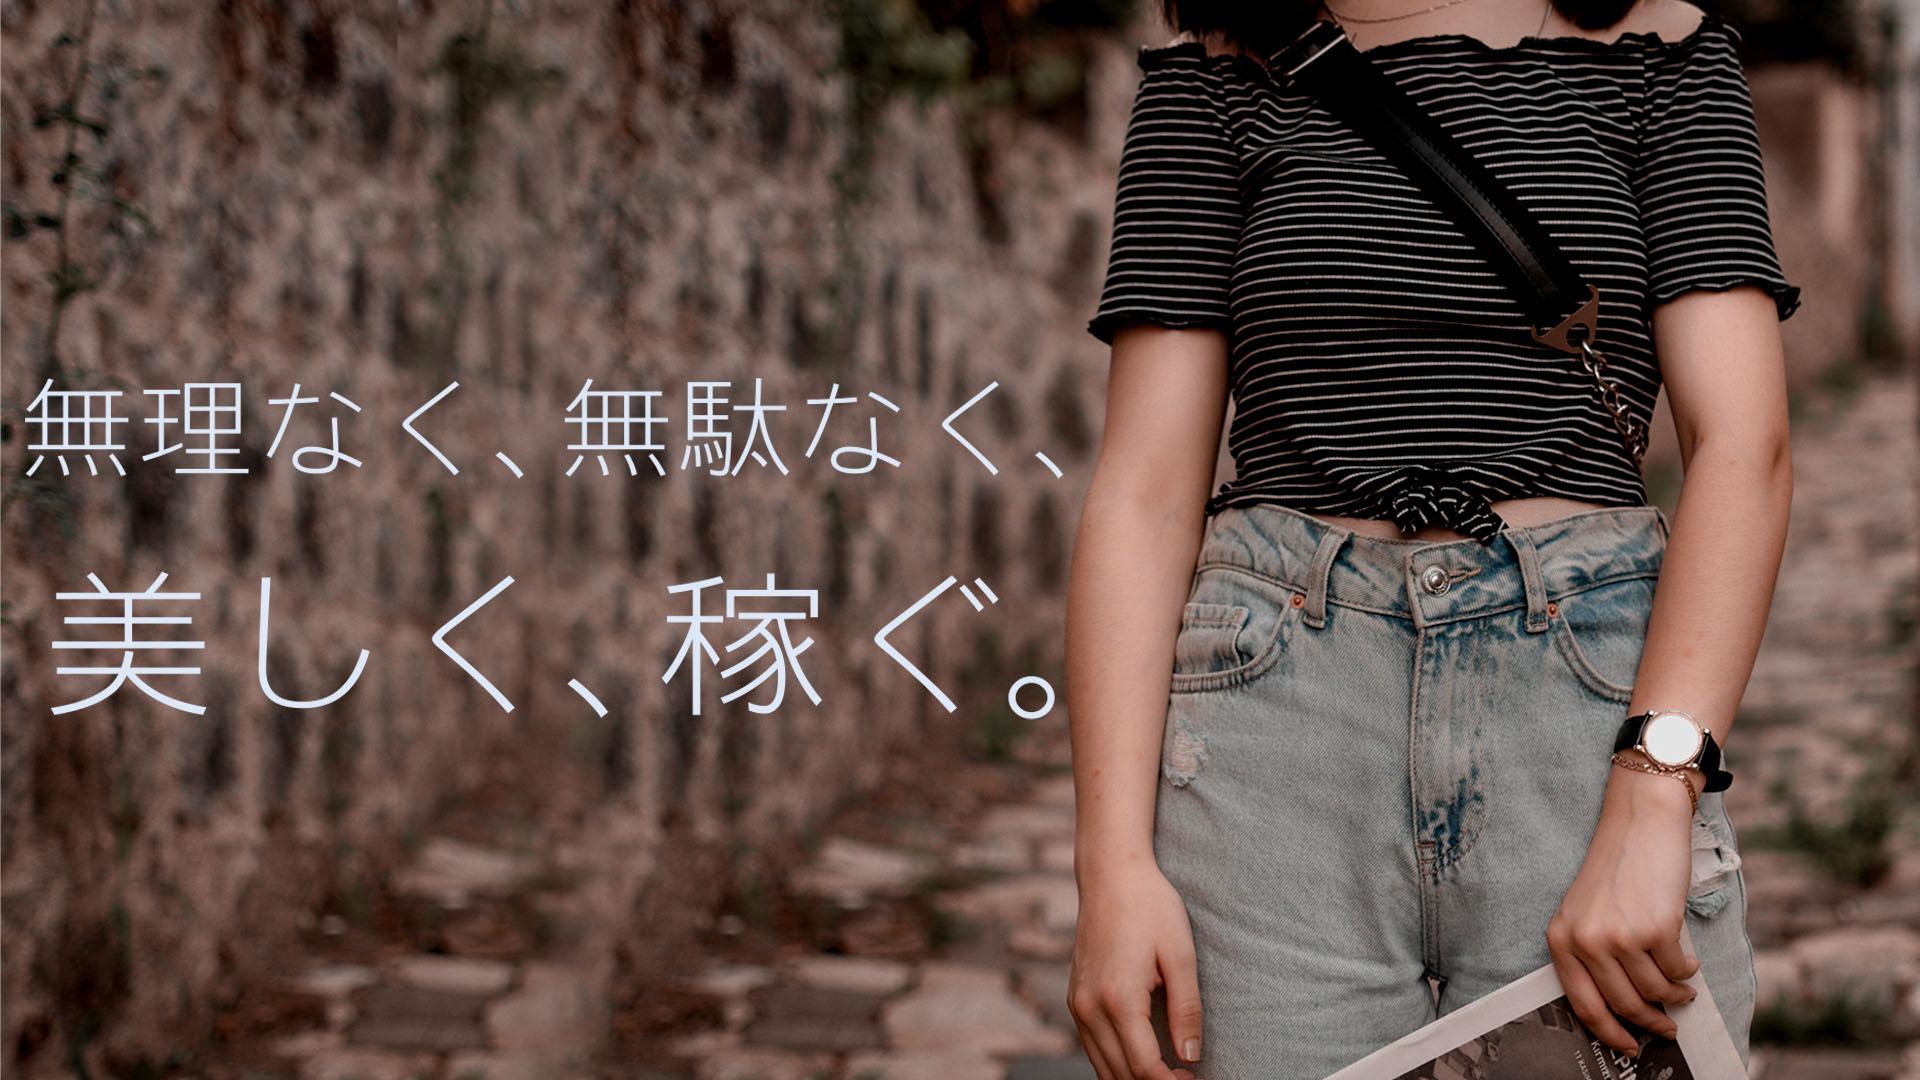 One More 奥様 錦糸町店の求人画像